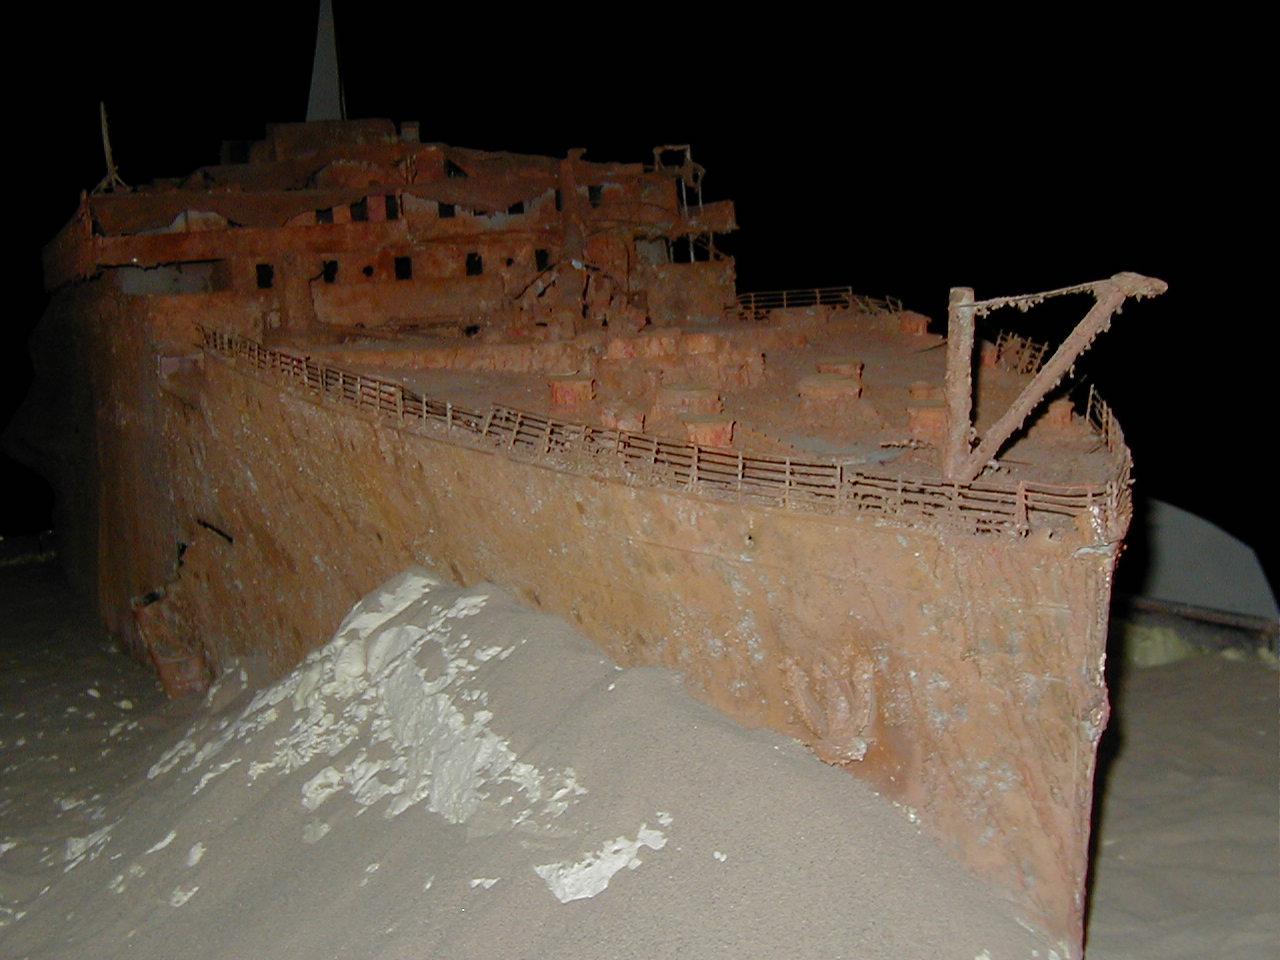 http://1.bp.blogspot.com/-dZ7j2H5Gg-I/TyY-T9IWcLI/AAAAAAAAAH8/DOeJMdv1Aao/s1600/Titanic+wreck.jpg